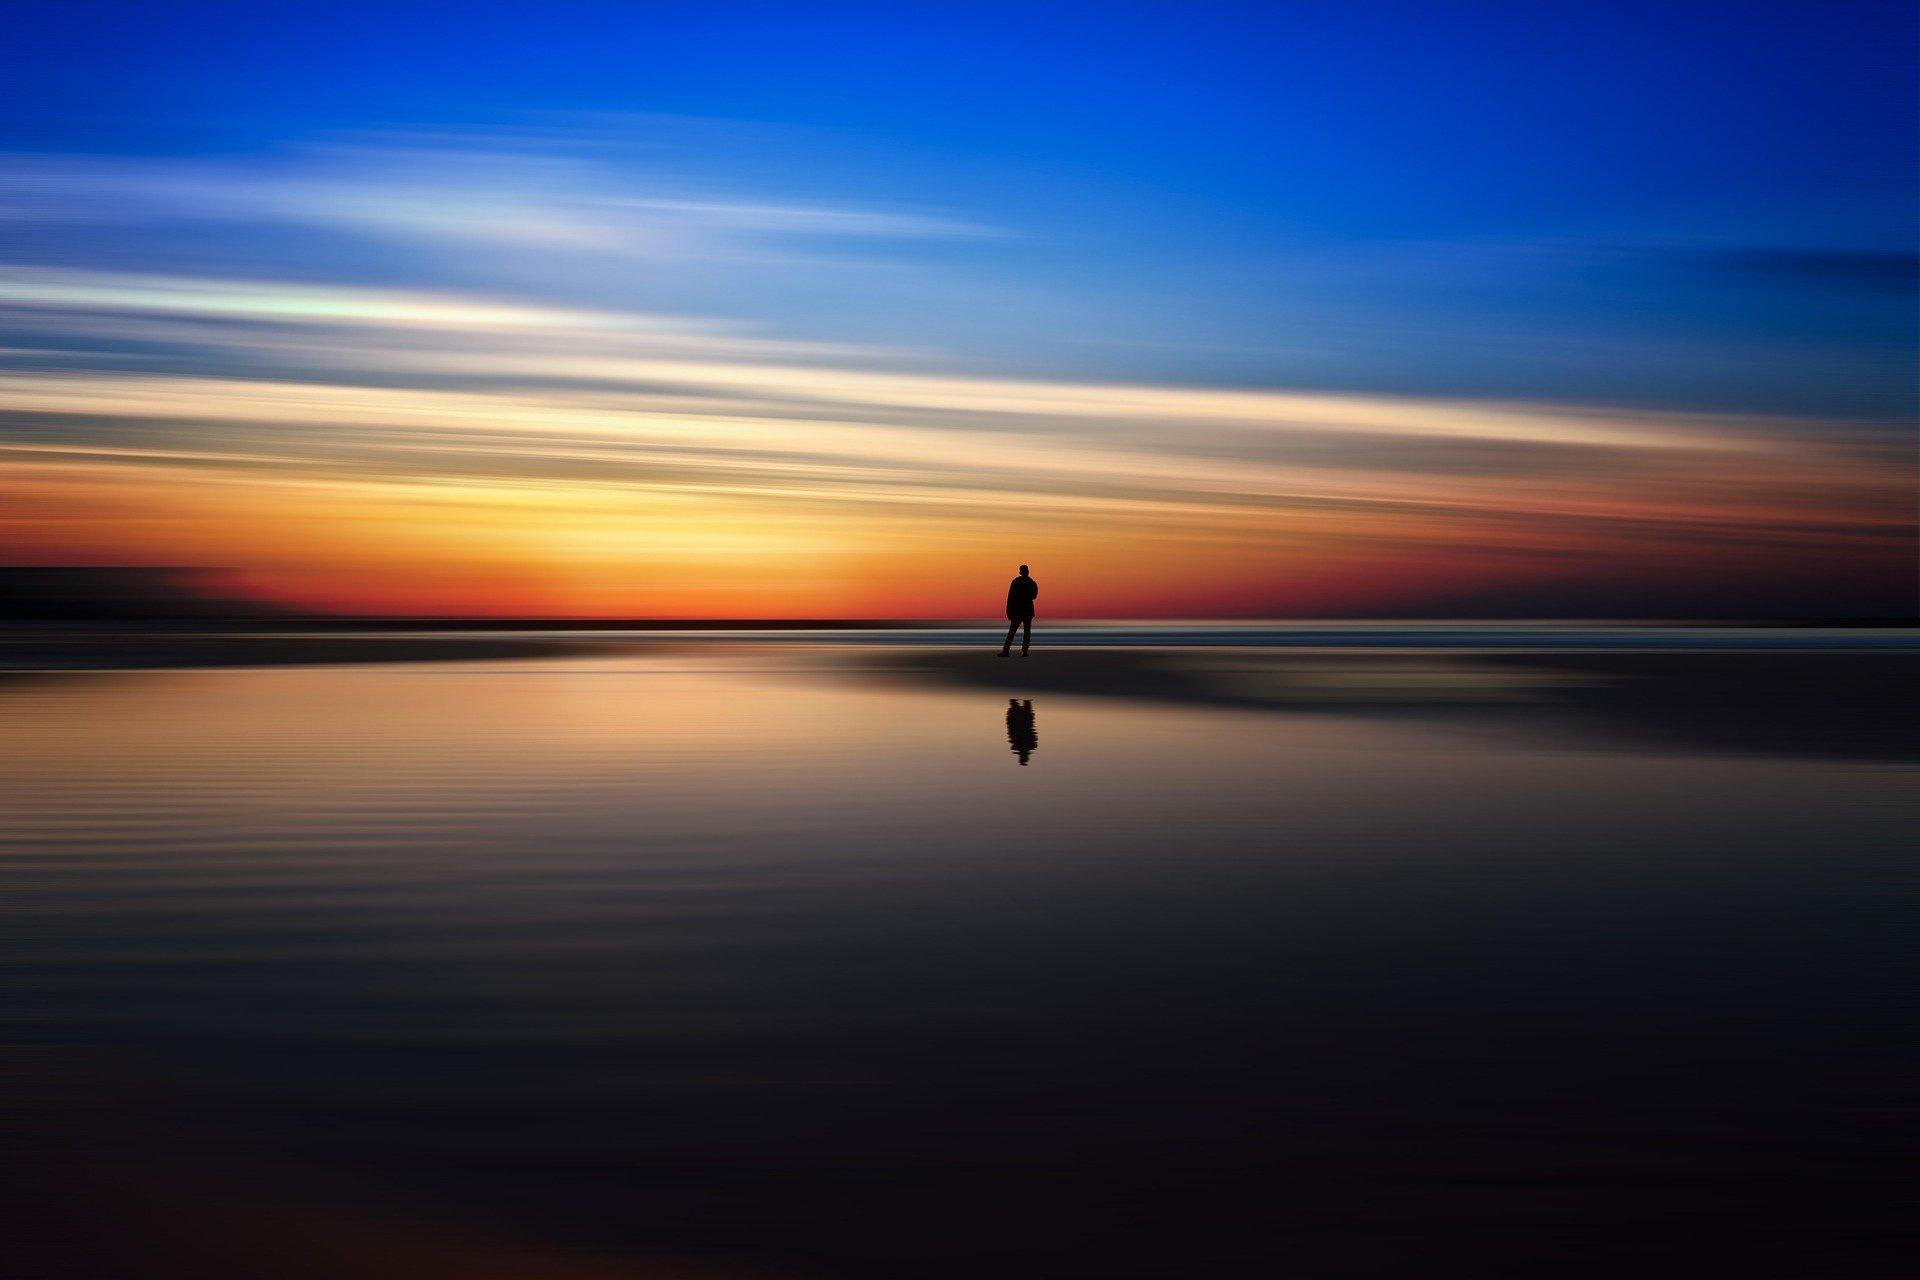 beach-1846697_1920 – Rizki Muhammad